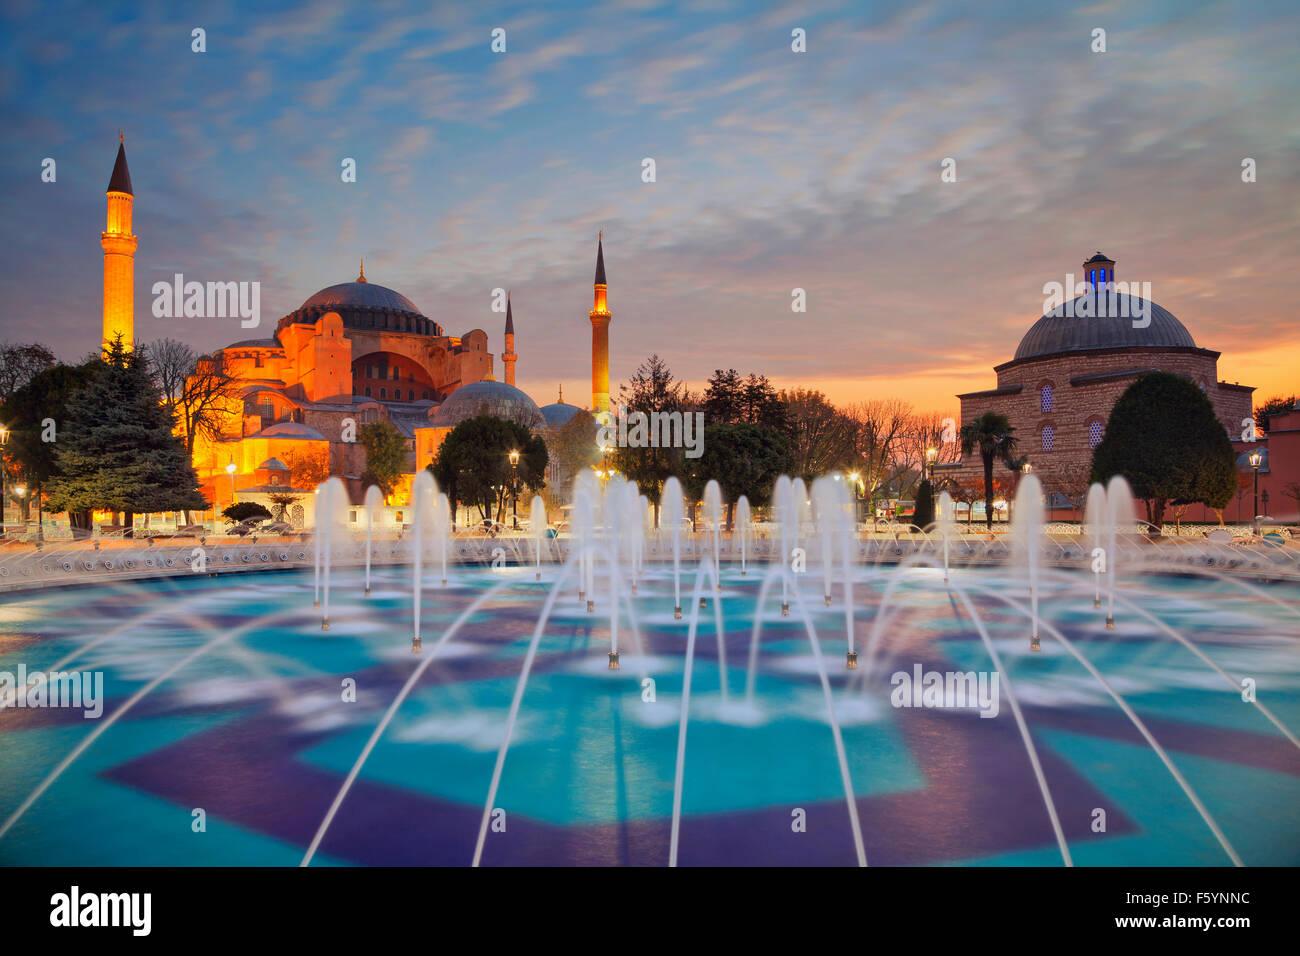 Istanbul. Image de Sainte-sophie à Istanbul, Turquie. Photo Stock